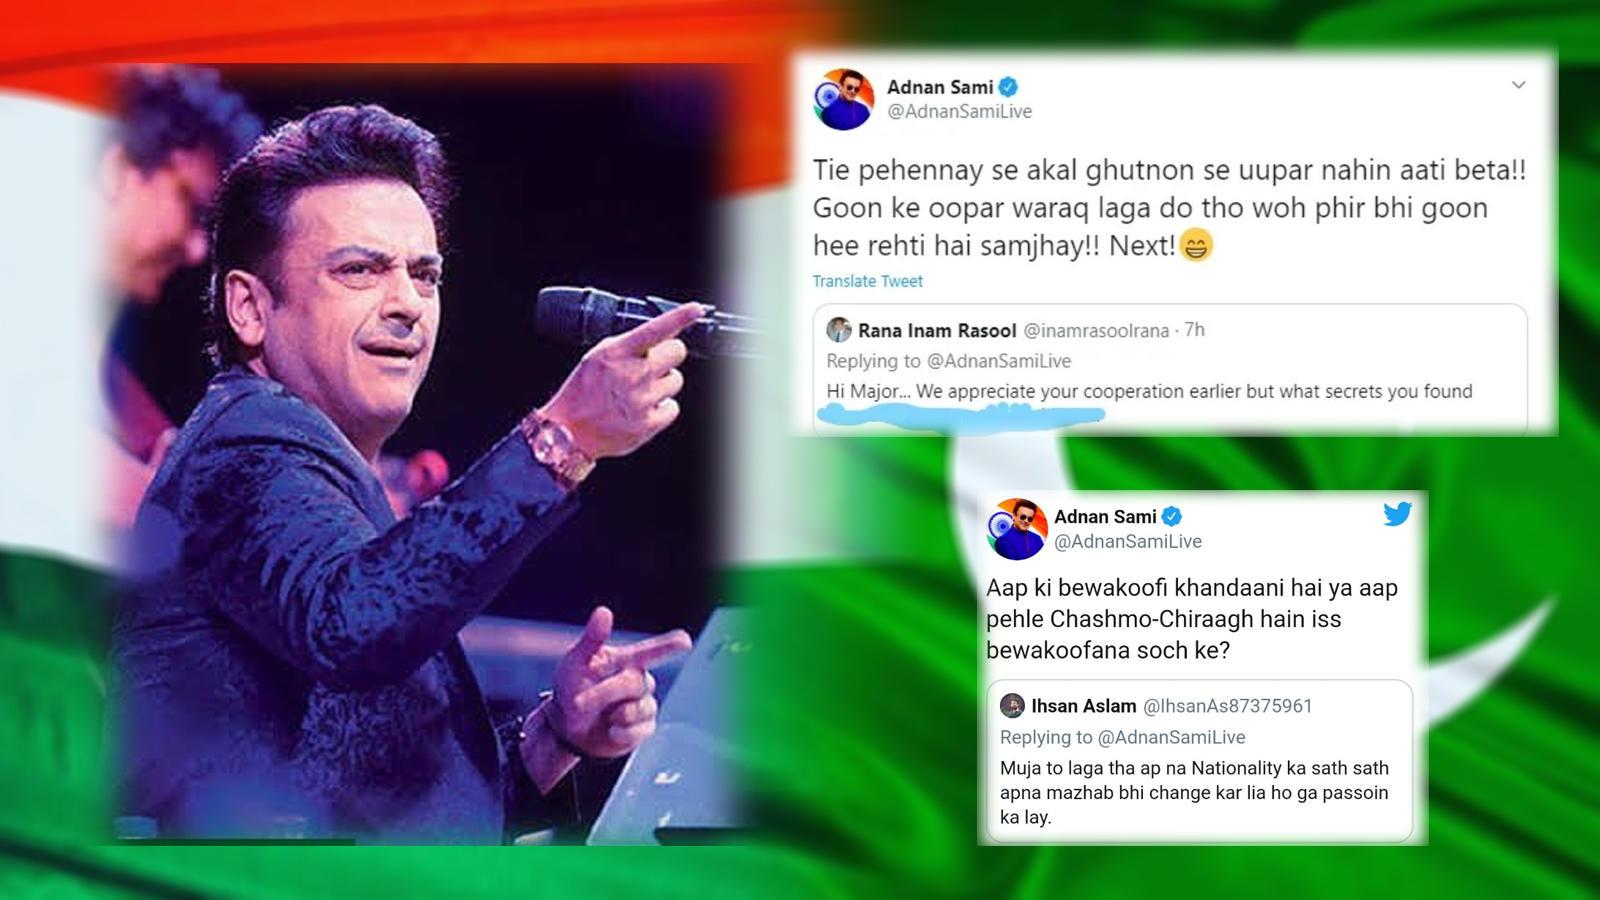 trolls-call-adnan-sami-a-pakistani-spy-again-singer-hits-back